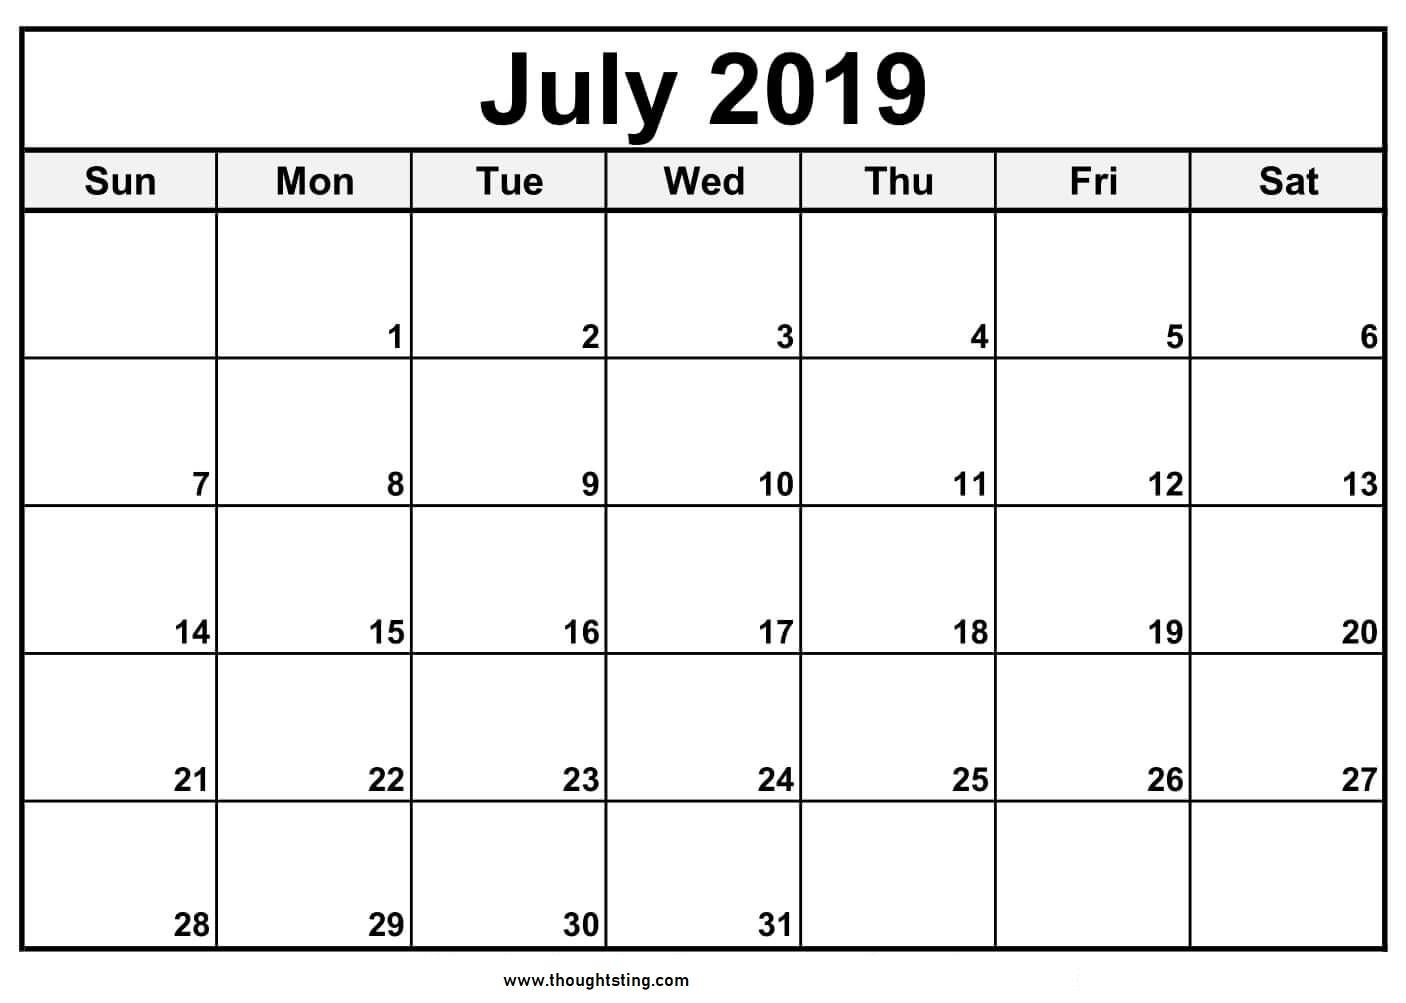 July Calendar 2019 Printable Template - Free Printable Calendar throughout Blank July Calendar Printable